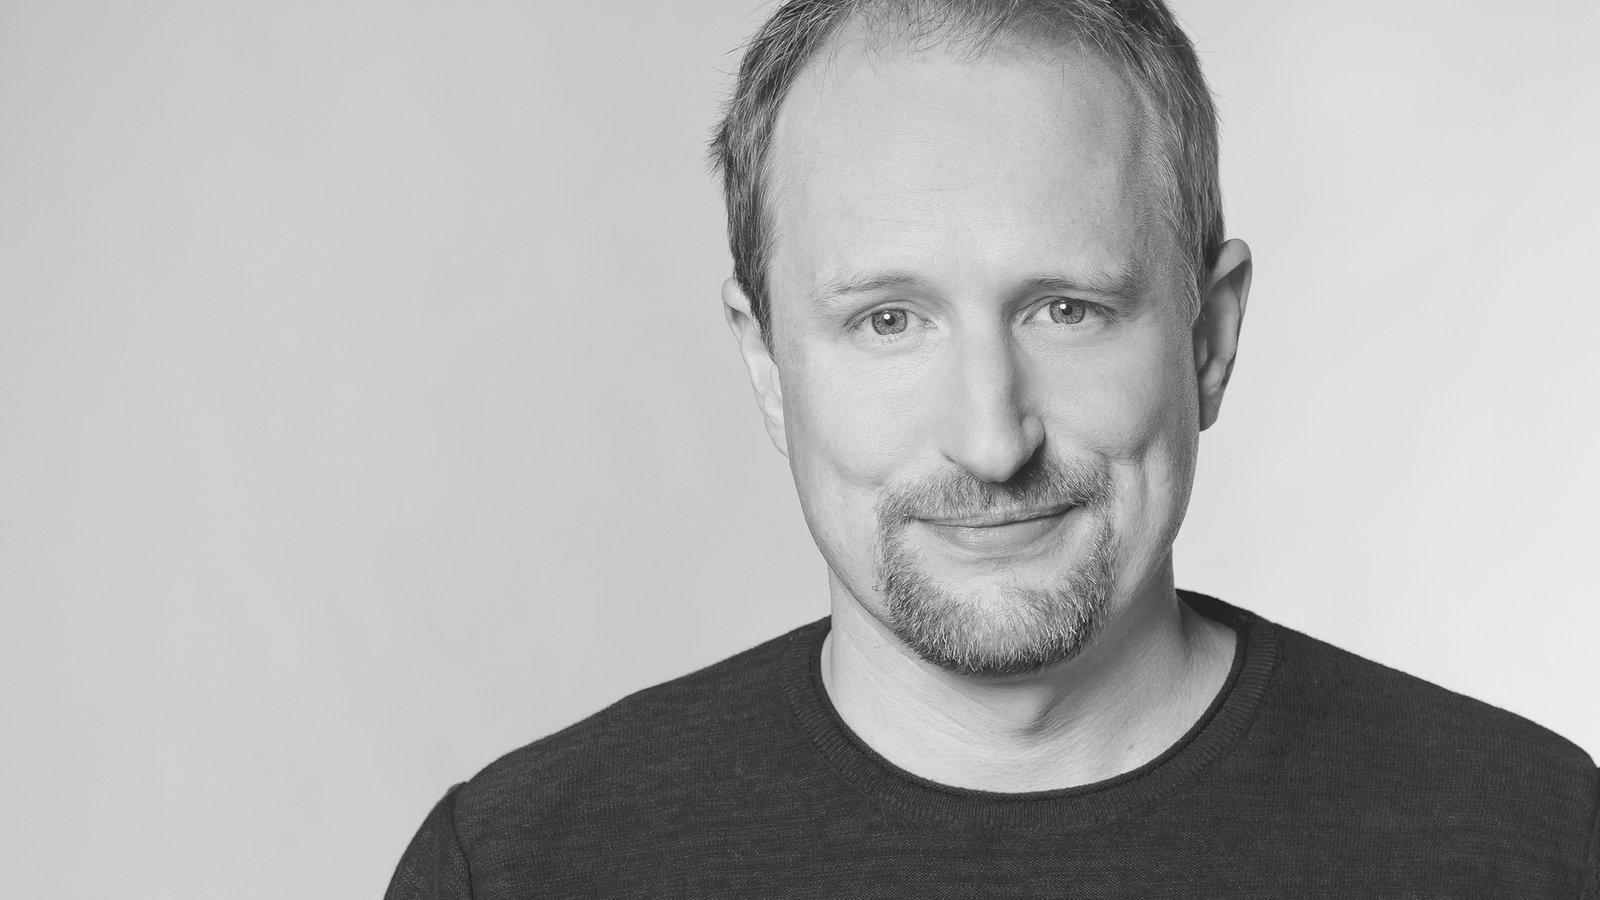 olli briesch - Matthias Malmedie Lebenslauf